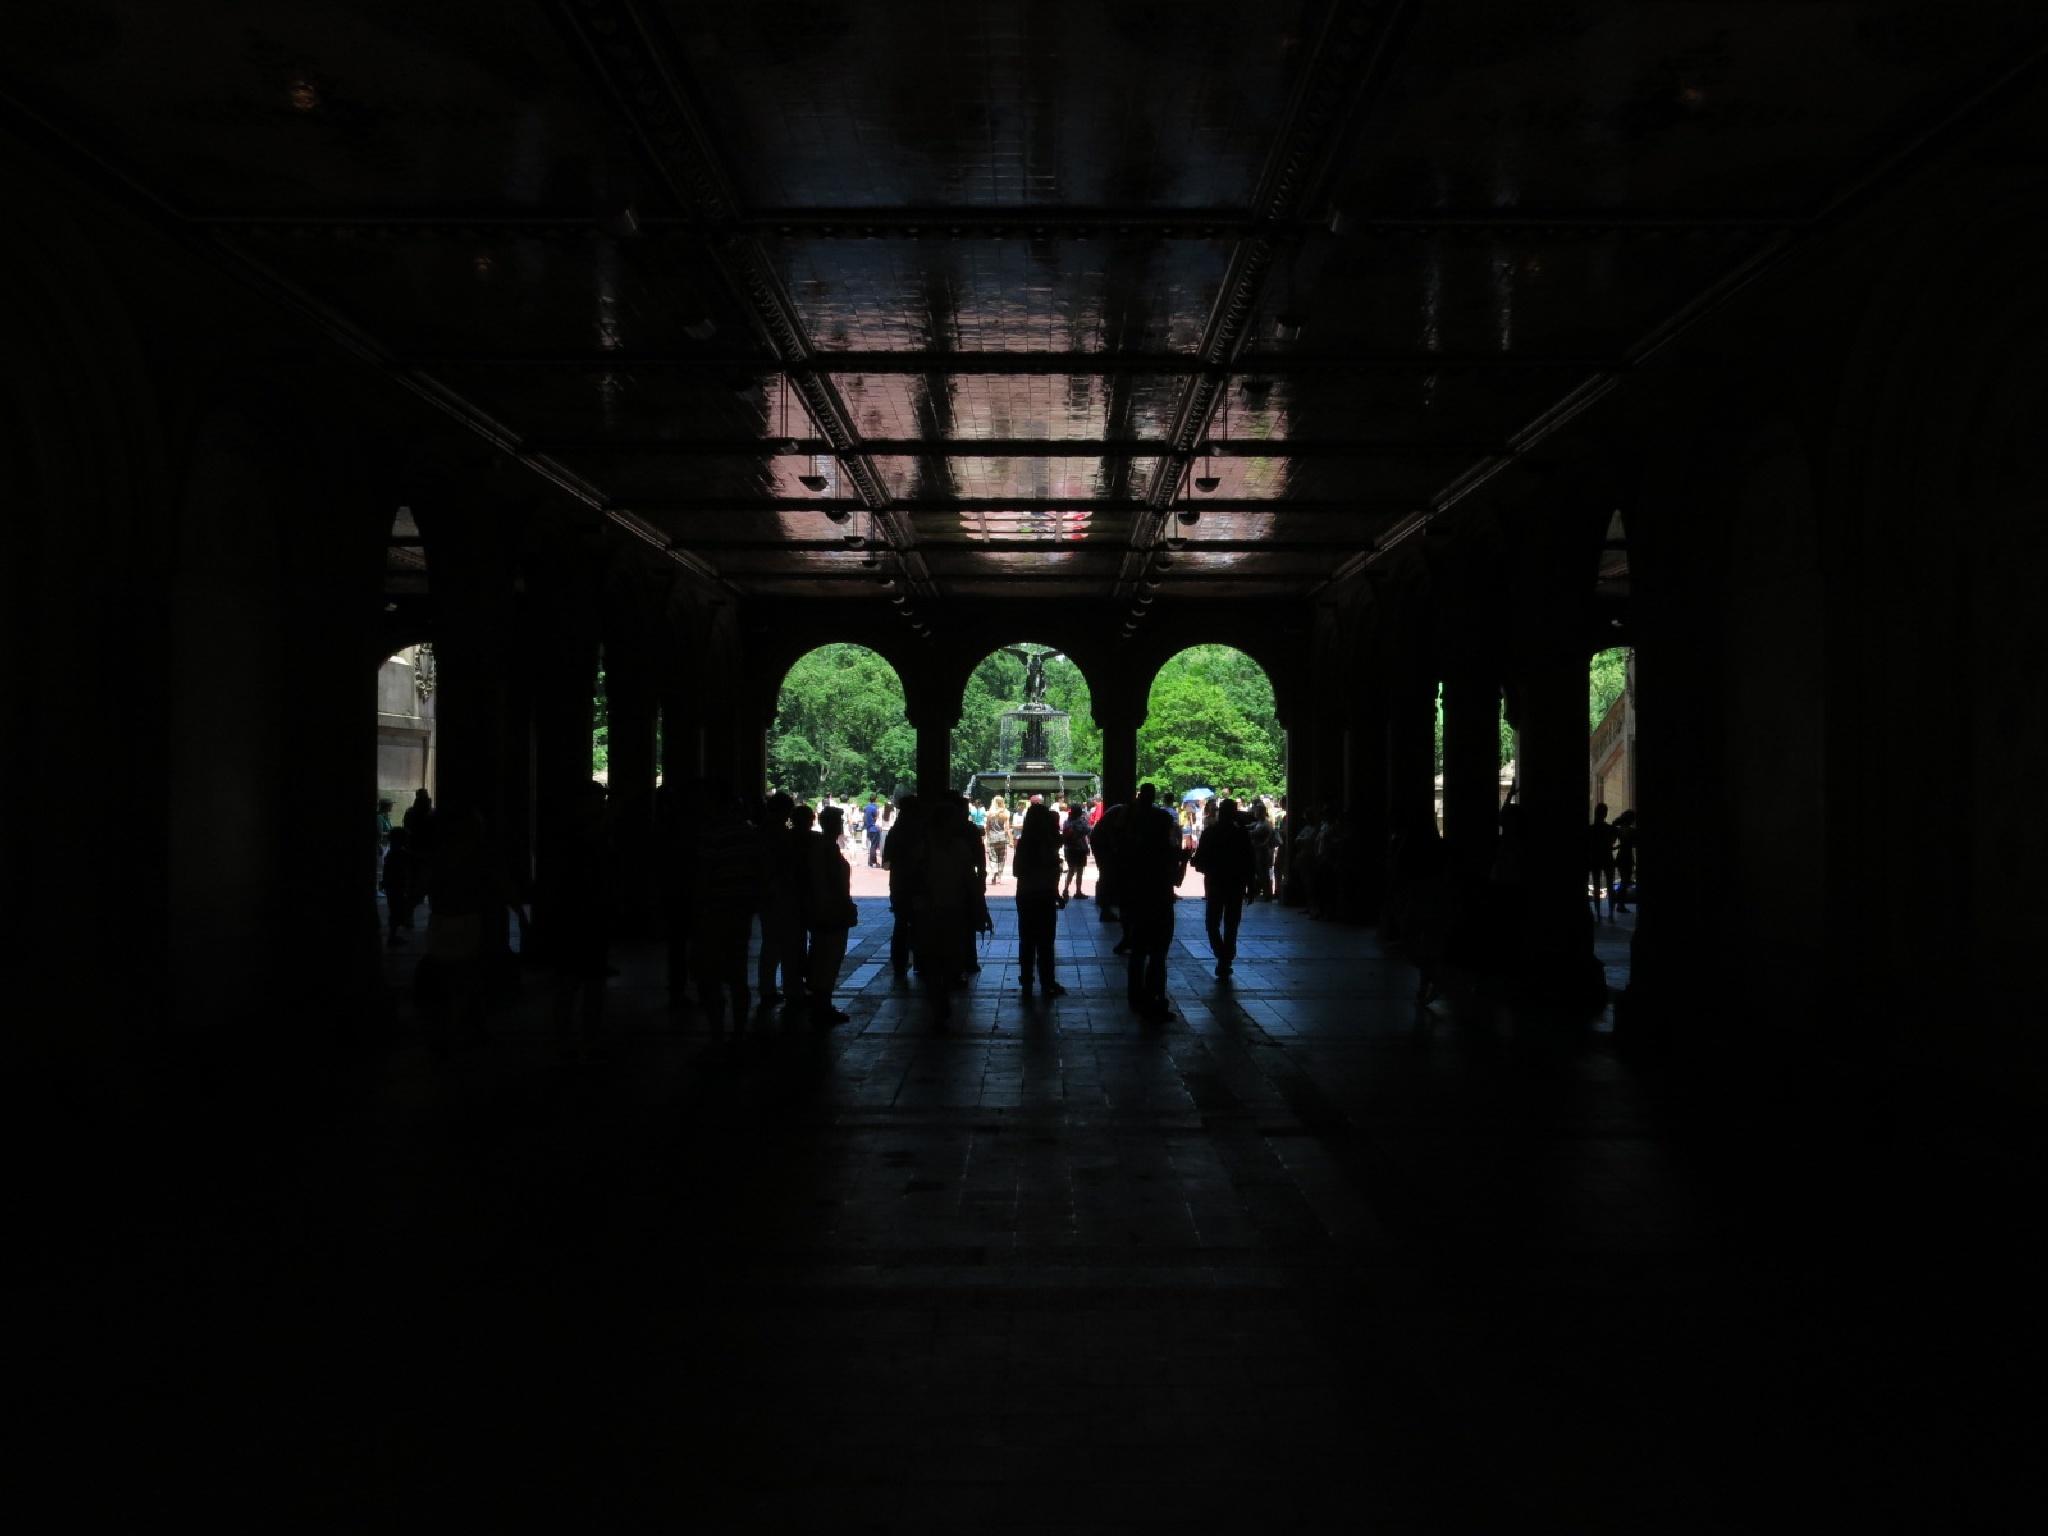 Central Park by martin.sahlberg.67